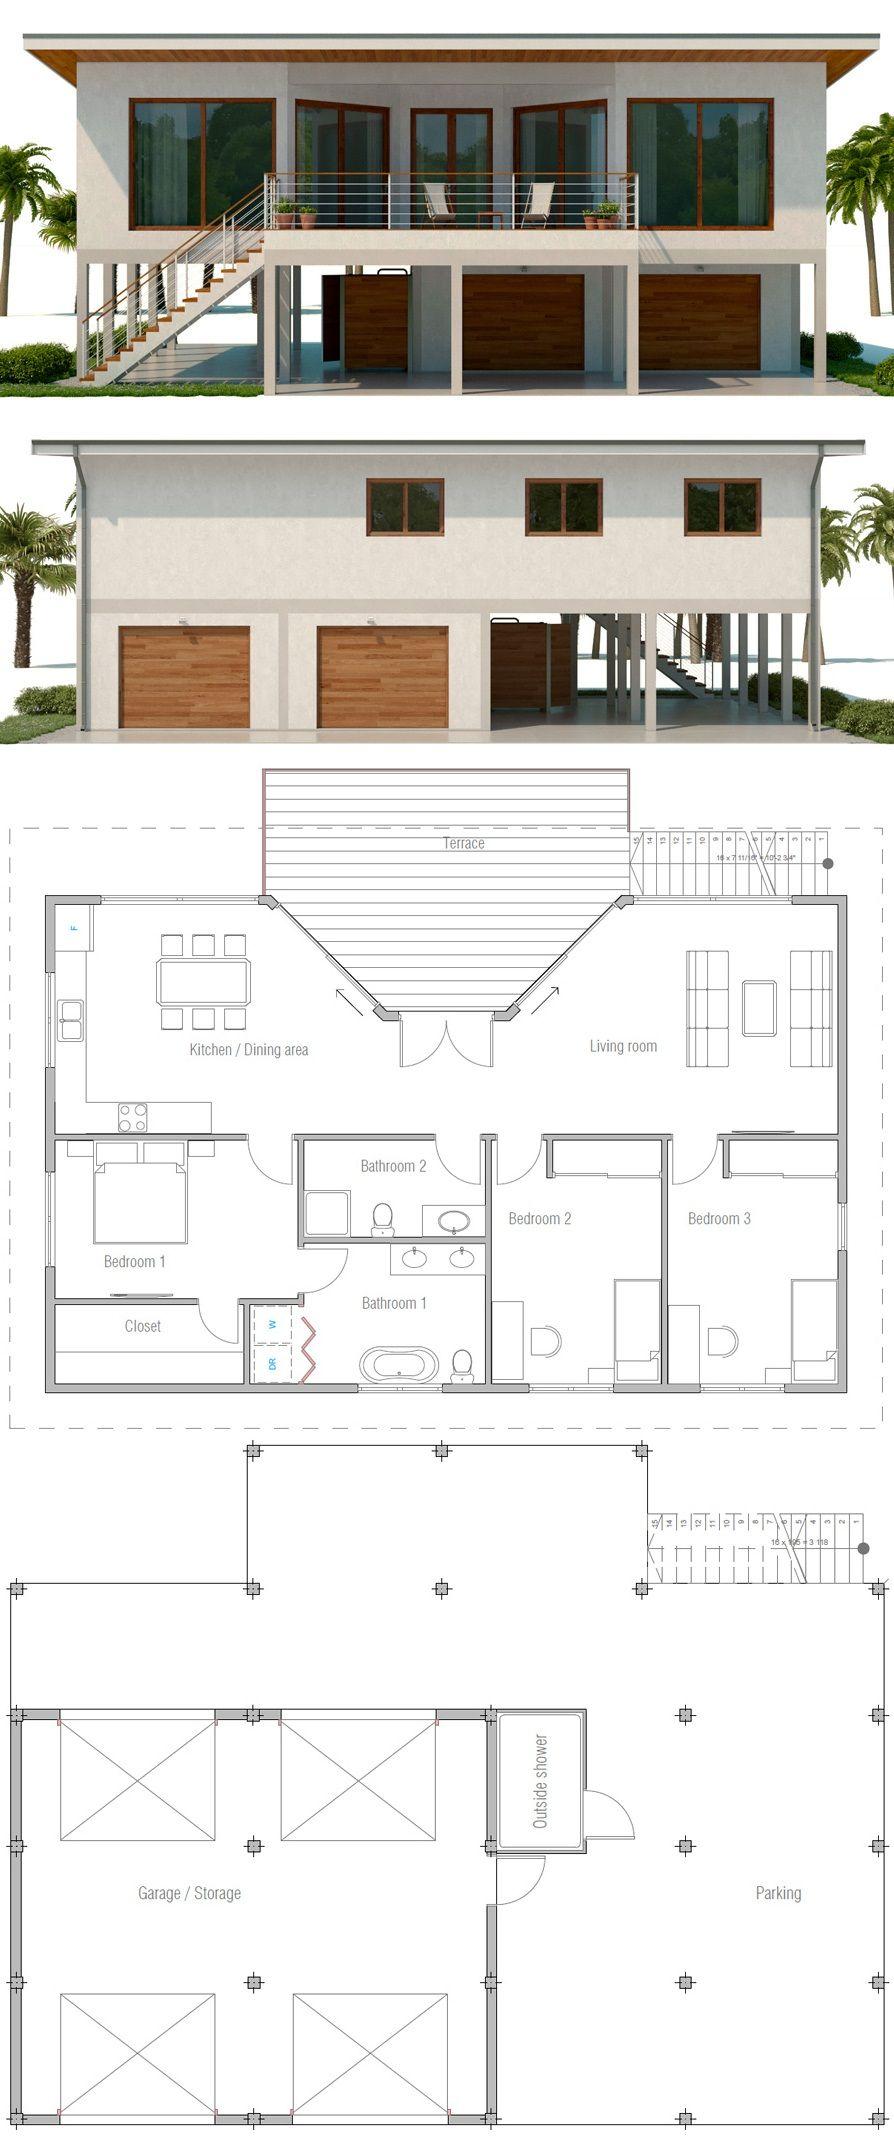 House Plan 2017 Coastal House Plans Countryside House Small Beach House Plans